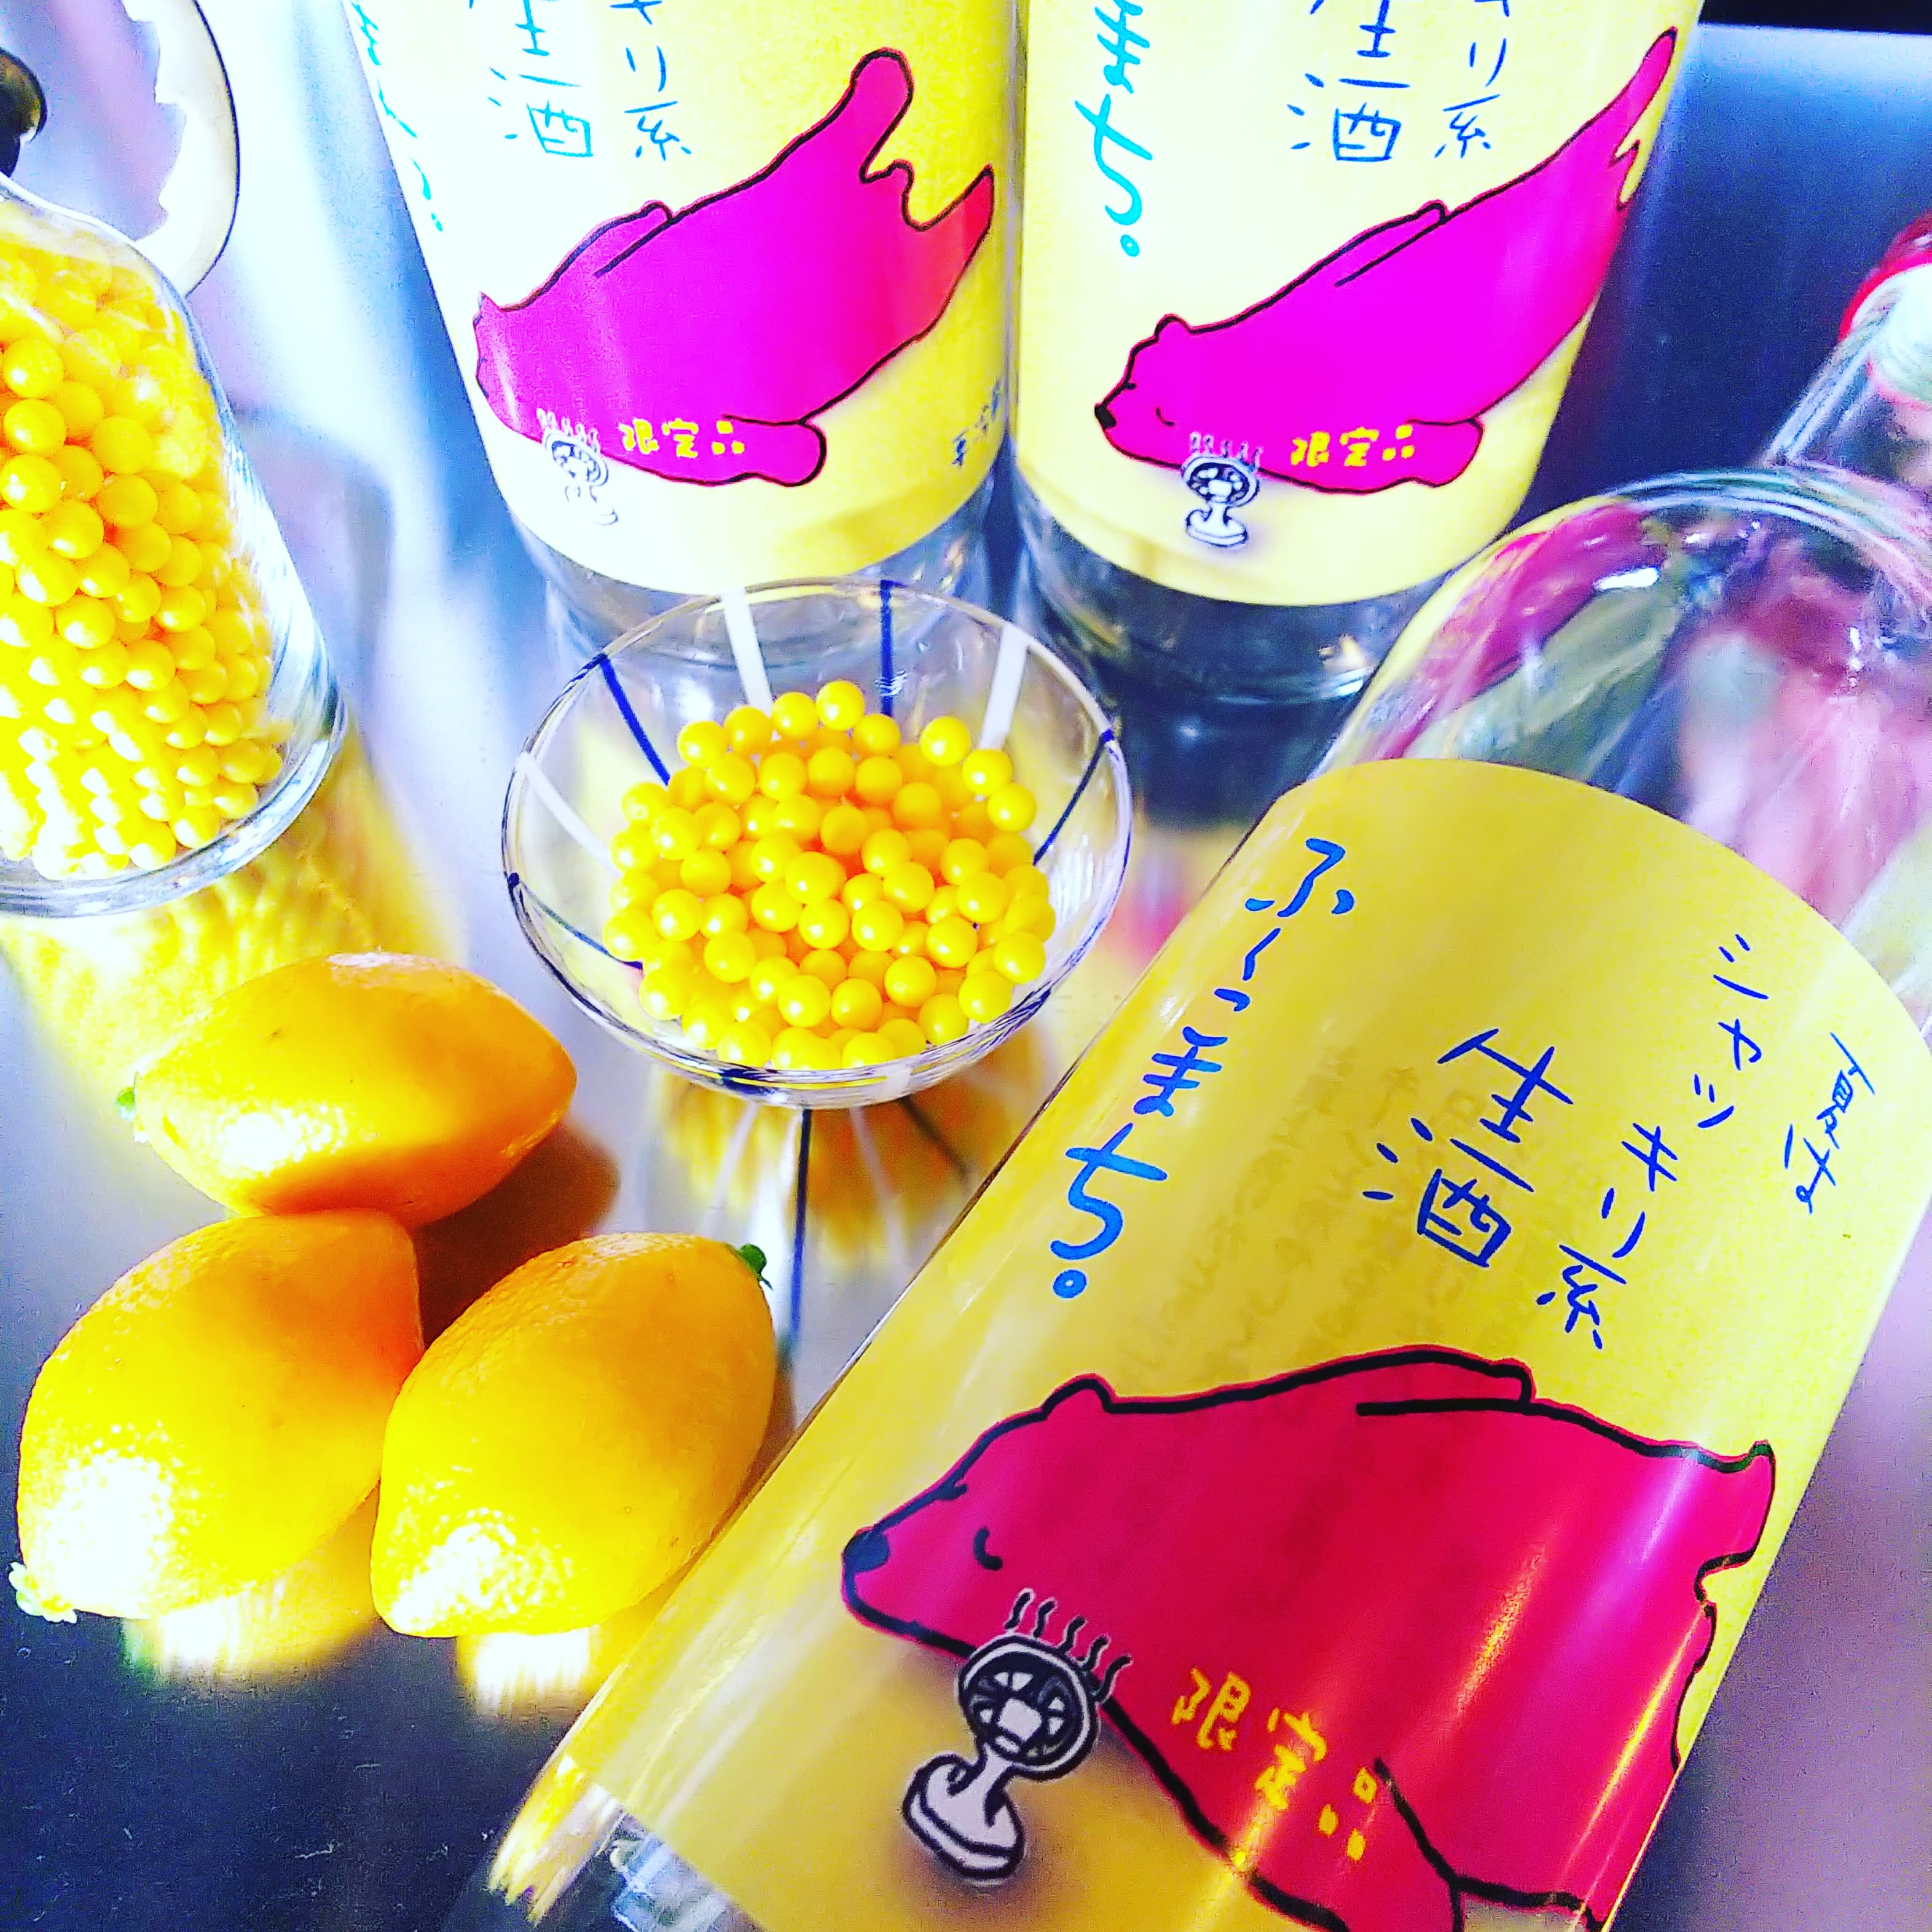 http://www.fukukomachi.com/blog/photo/IMG_20210714_200921_255.jpg